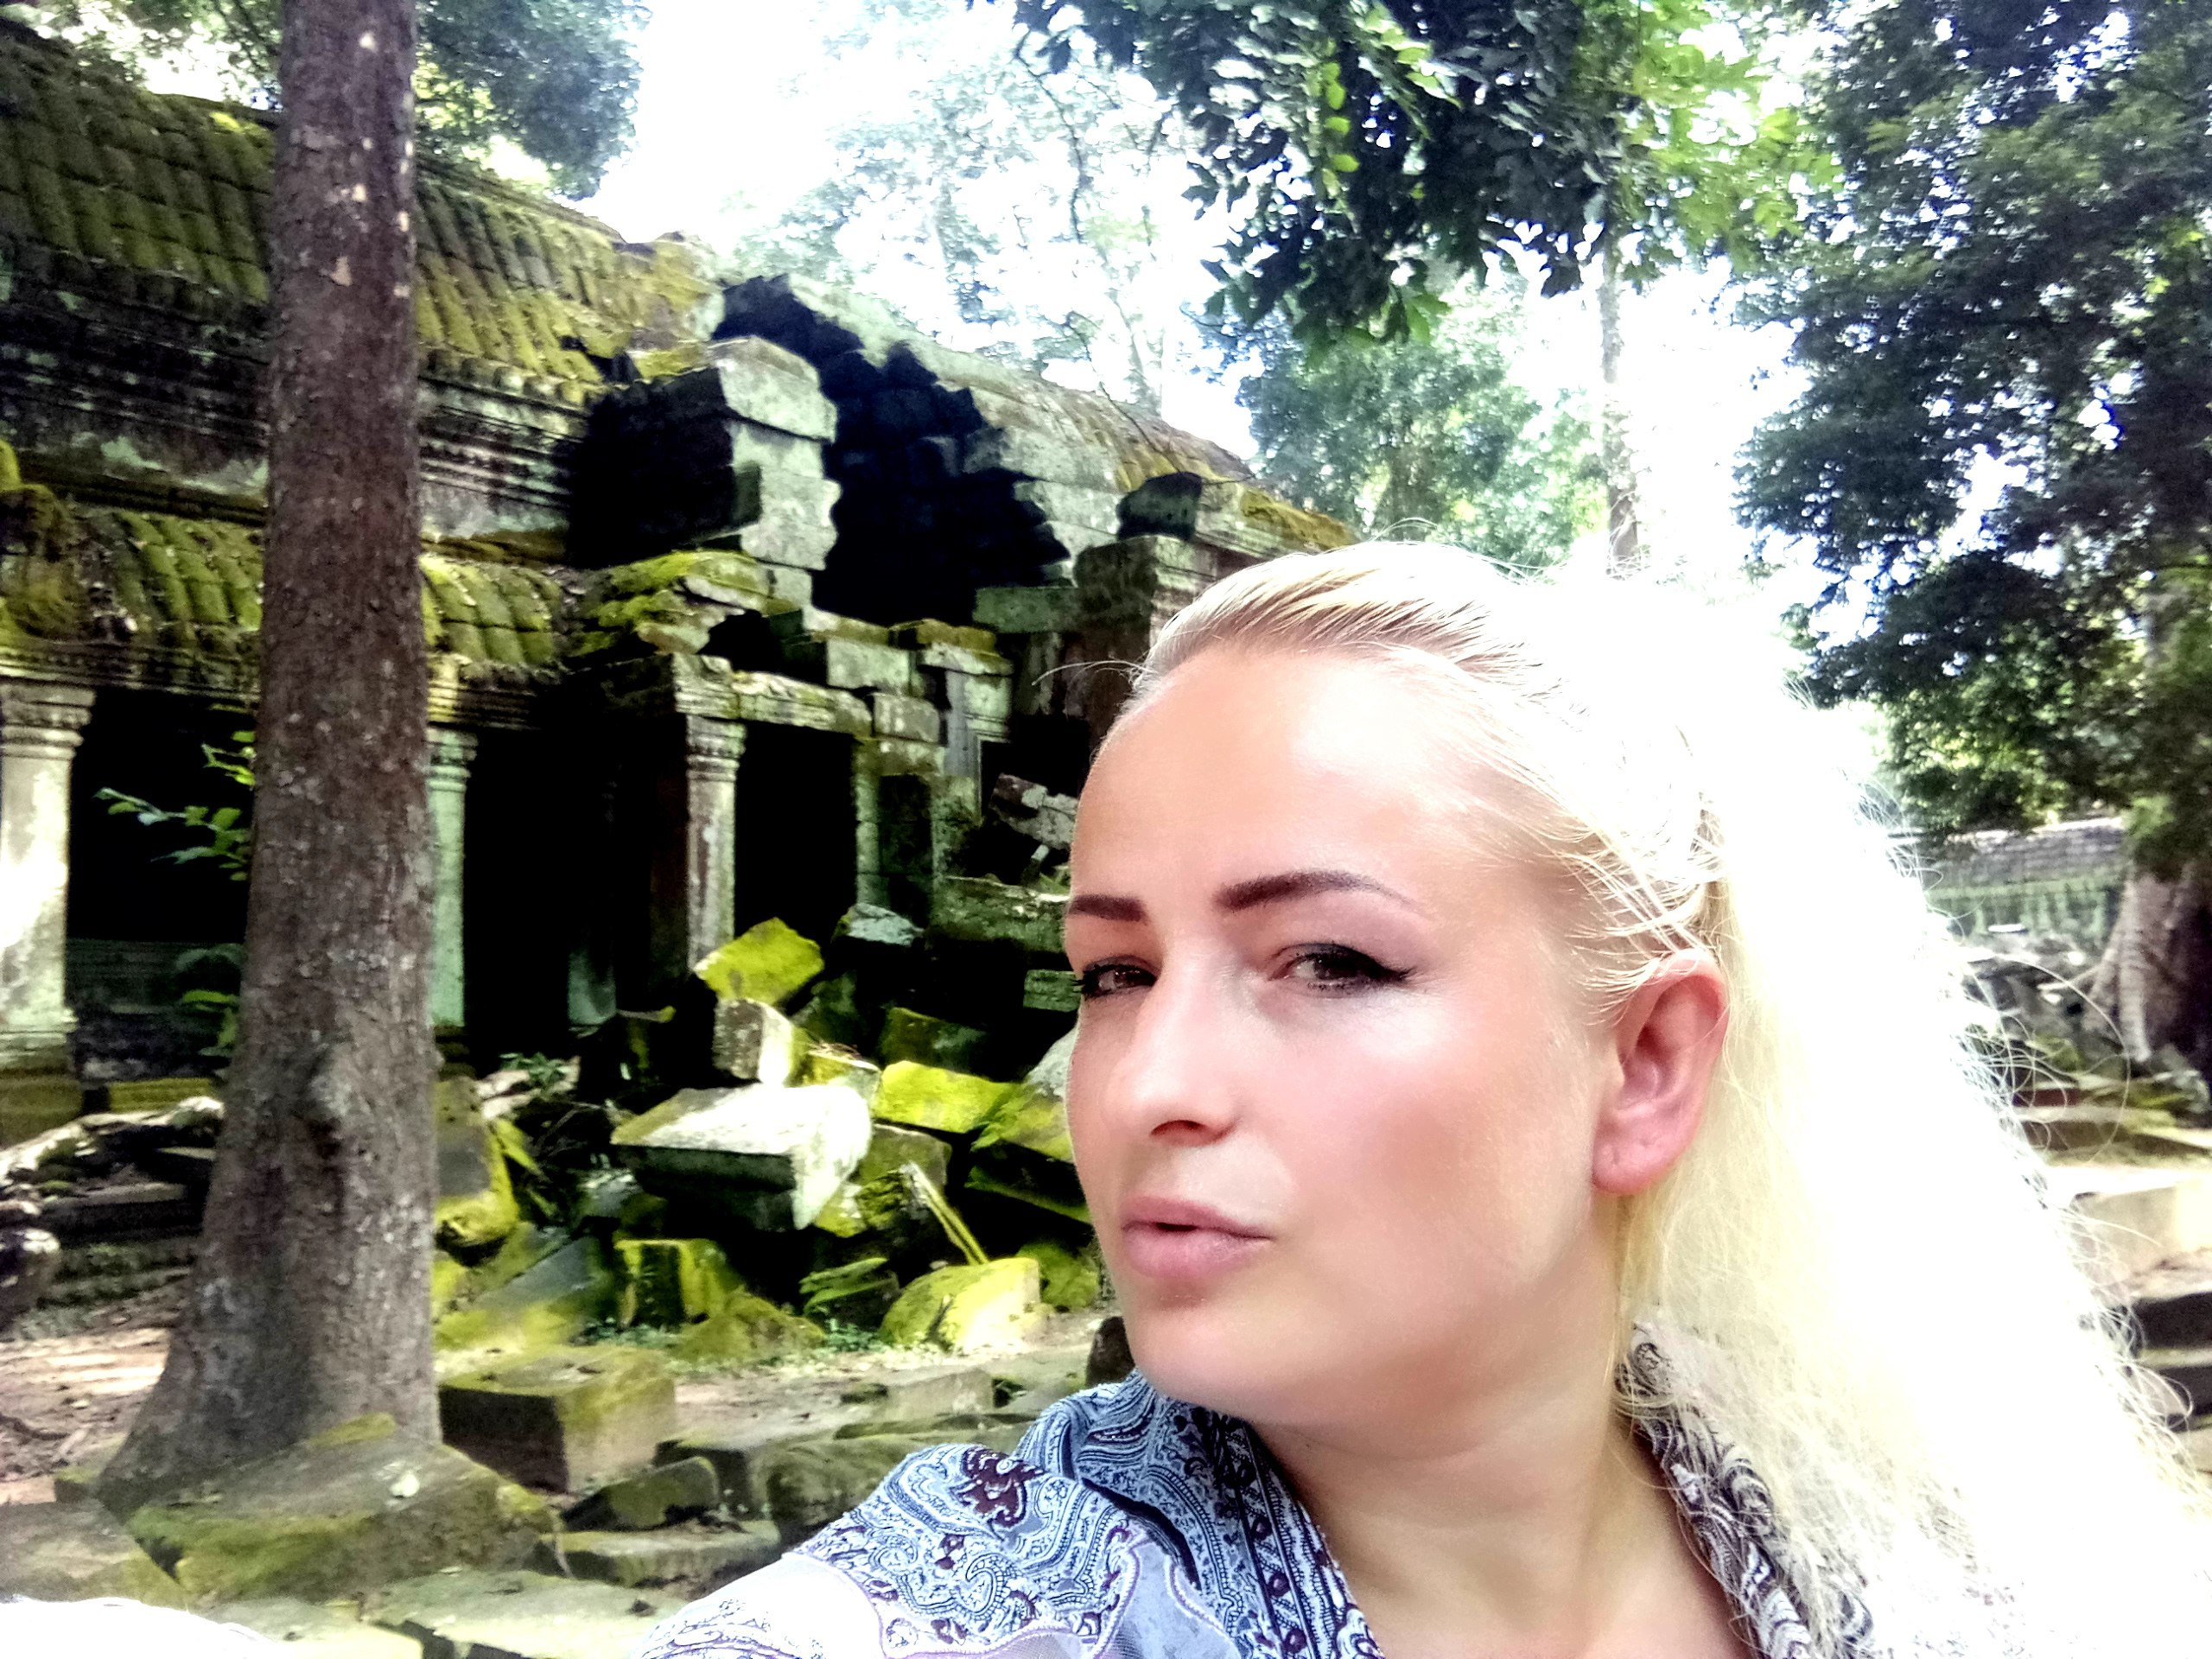 Елена Руденко (Валтея). Камбоджа. Ангкор. - Страница 3 WYDGsH4RnIA